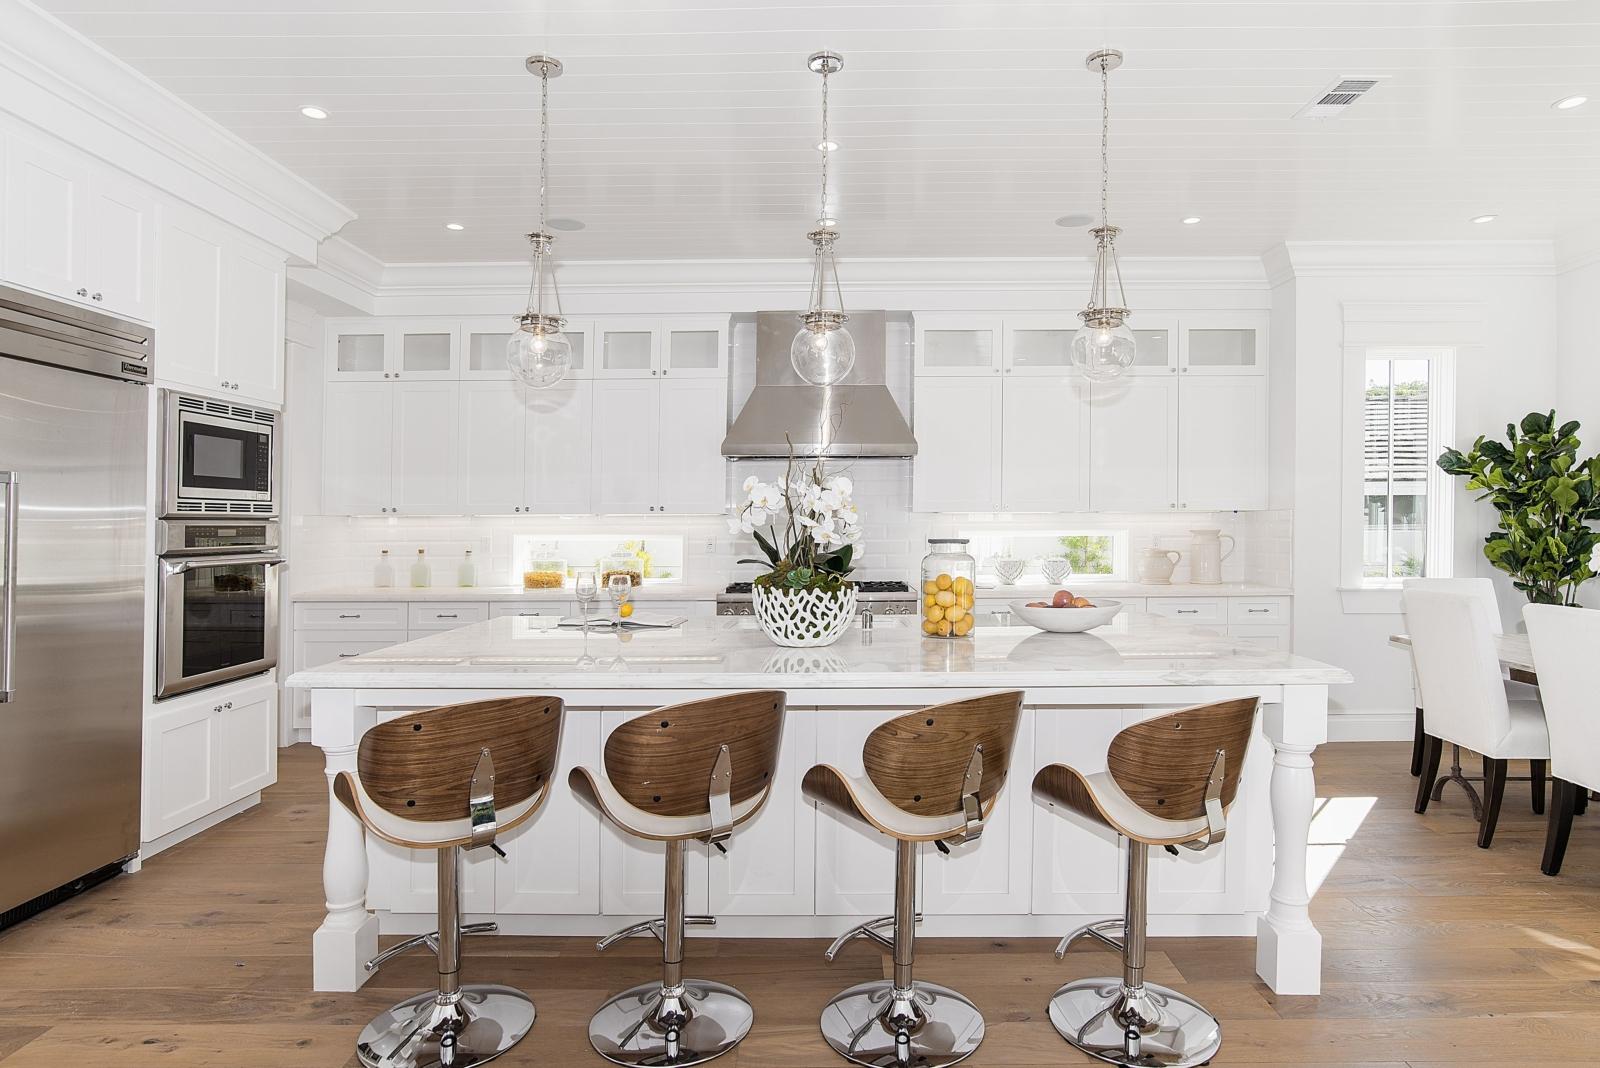 87+ My Home Design Style Quiz - Home Design Styles Rustic Interior ...